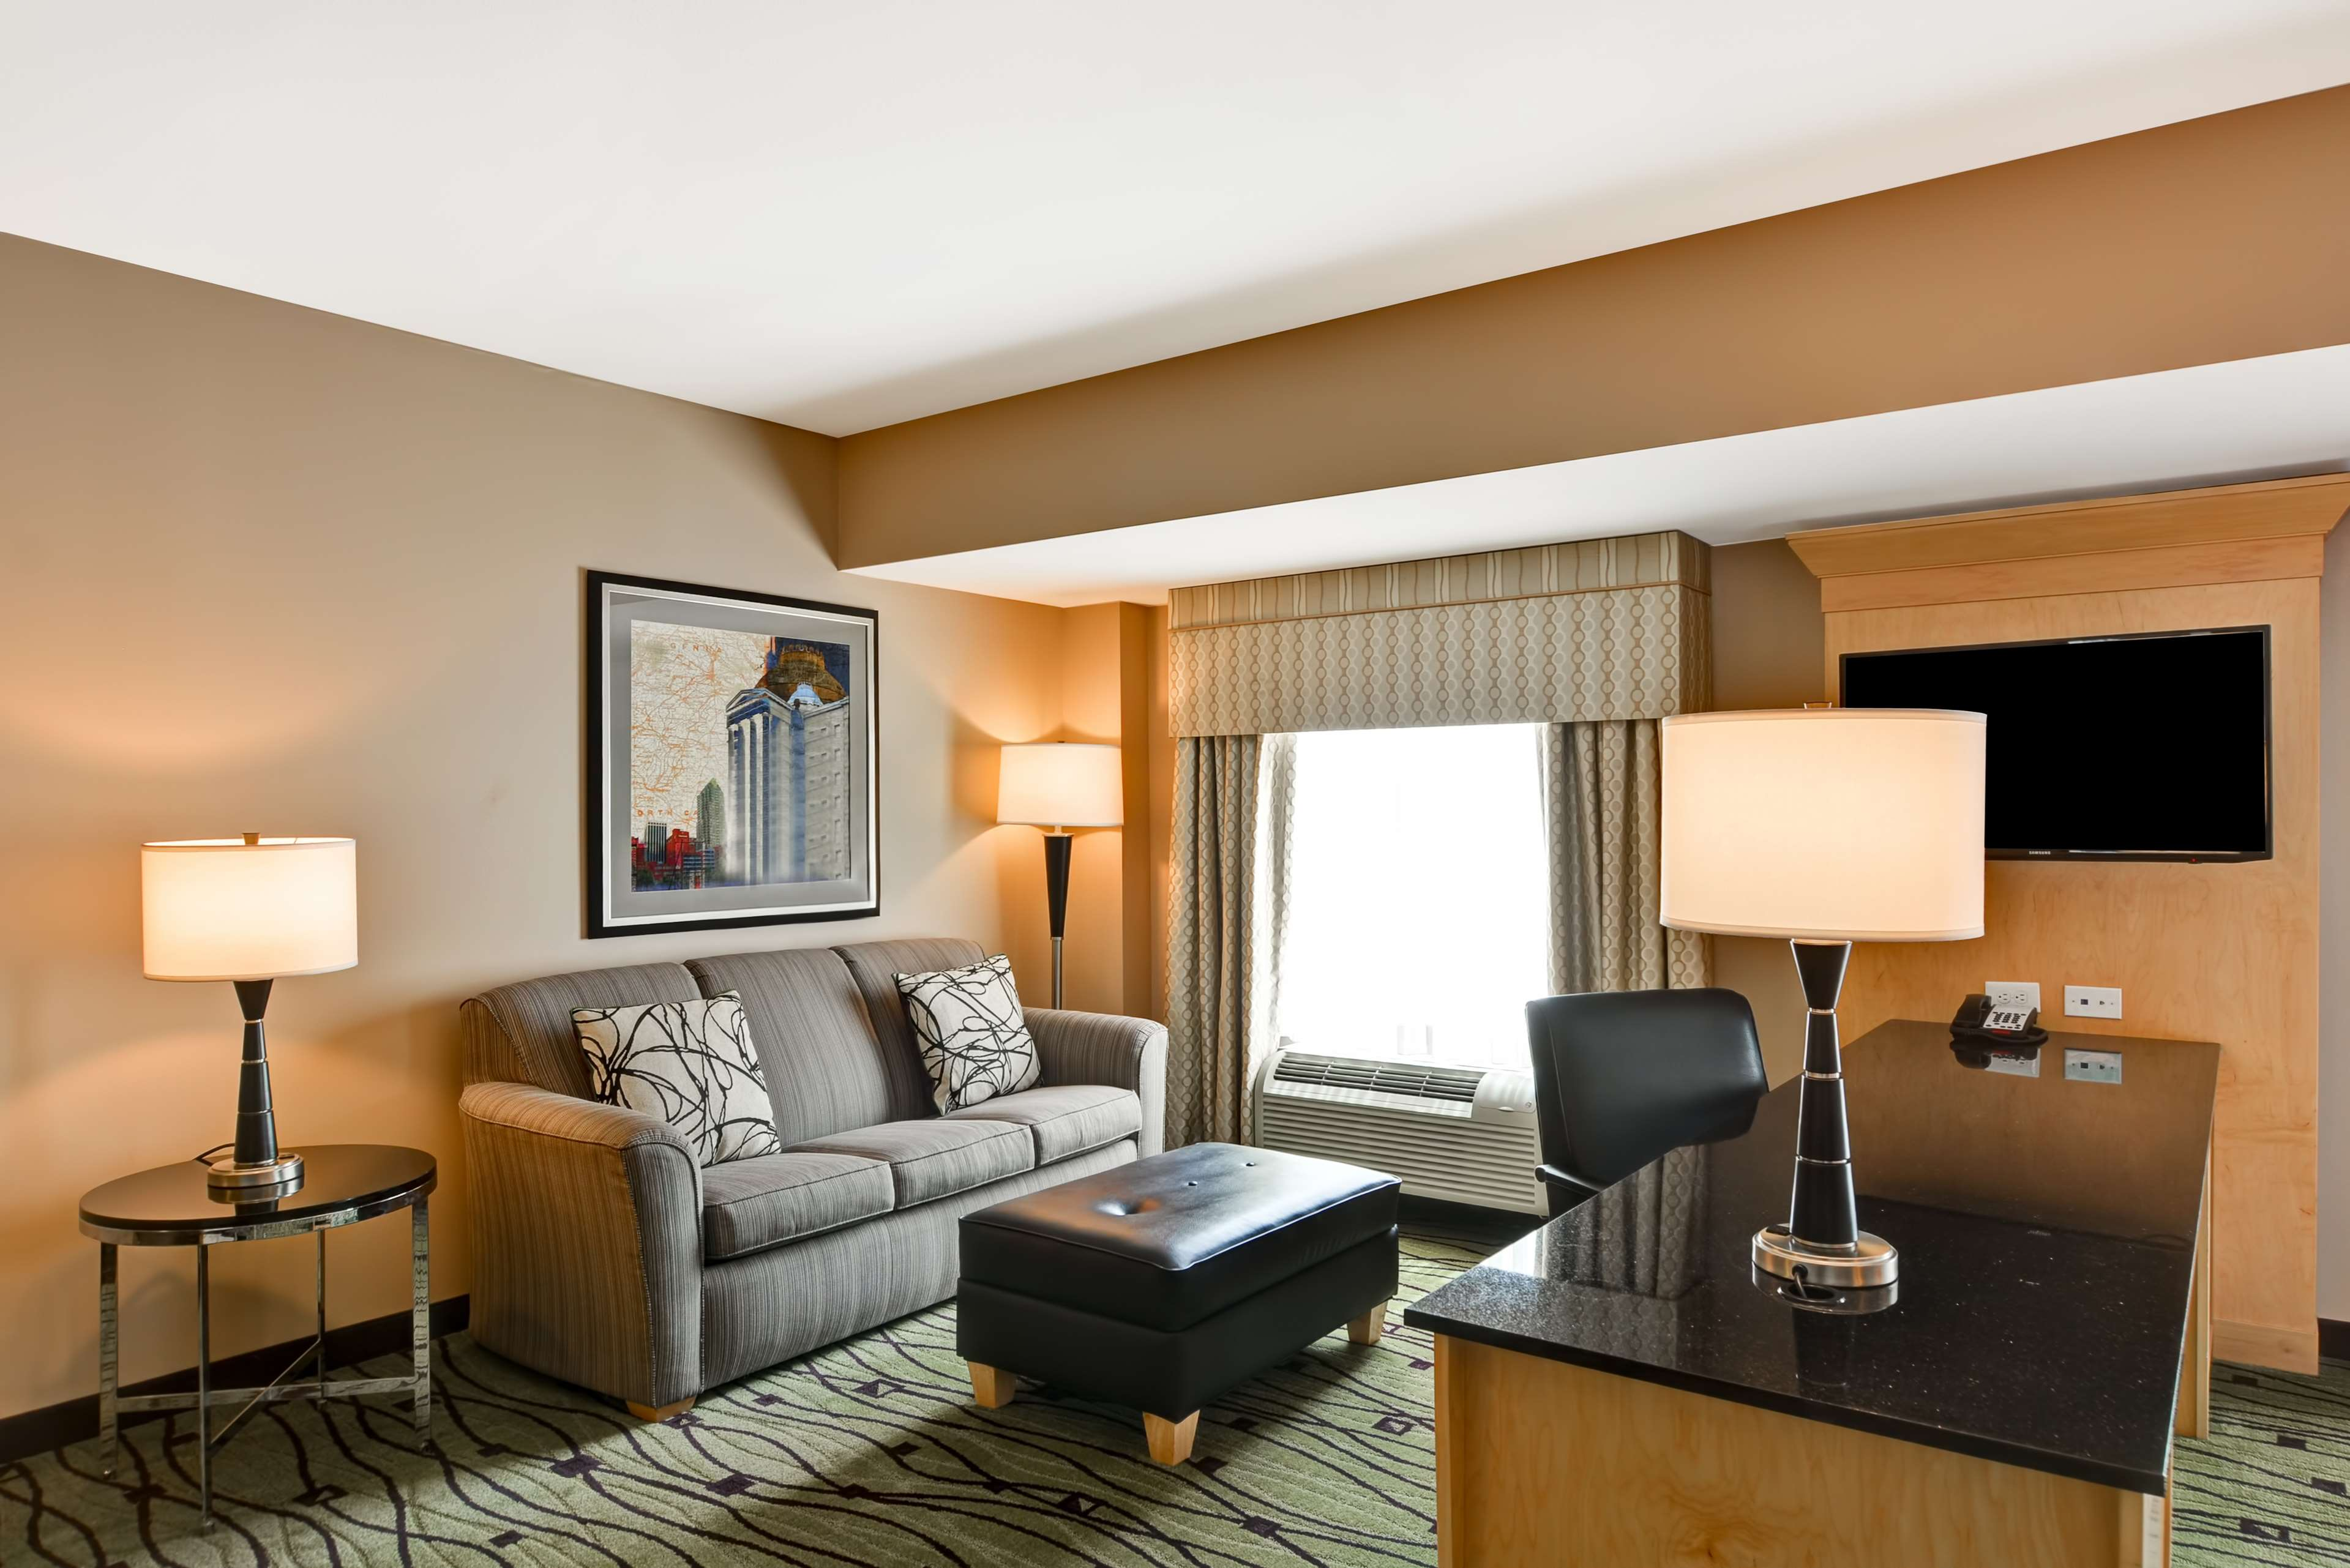 Hampton Inn & Suites Raleigh/Crabtree Valley image 33